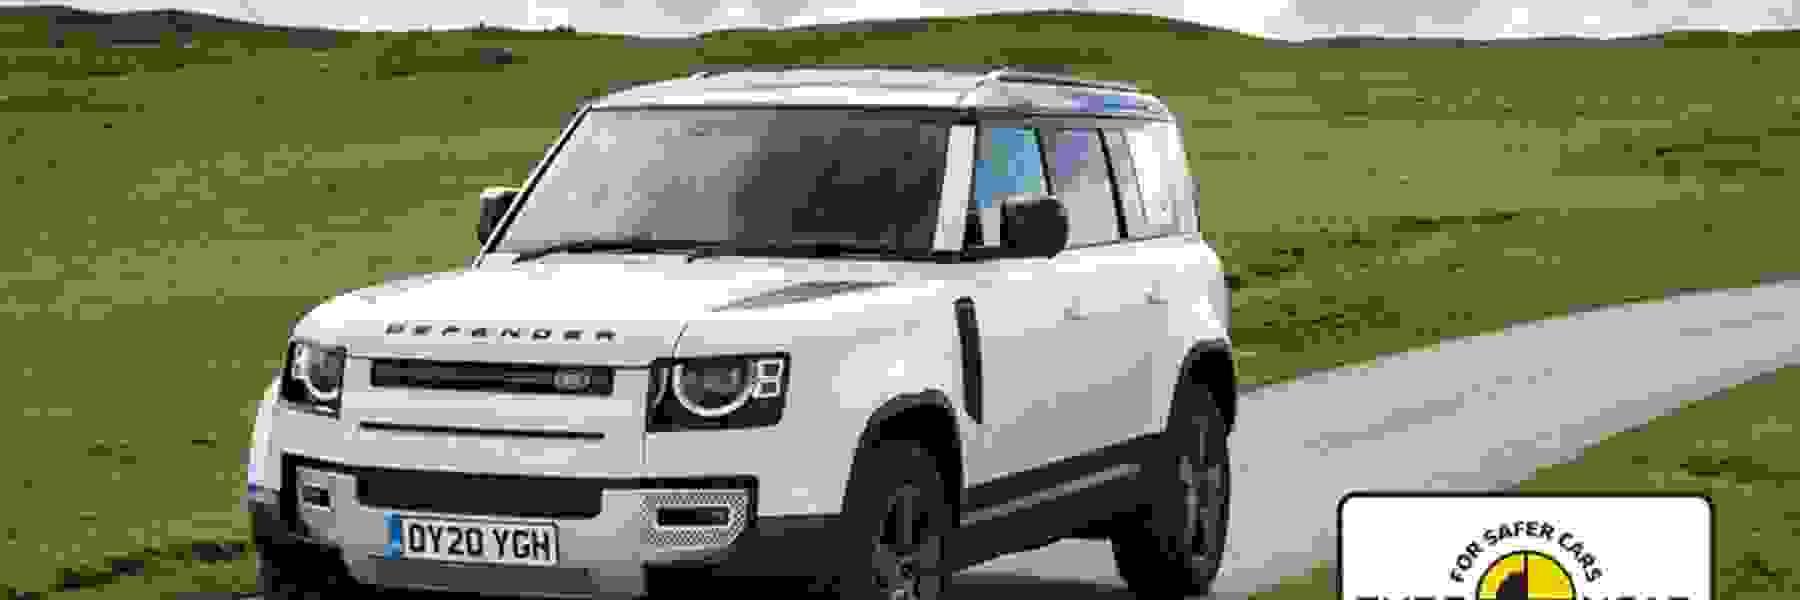 Land Rover Defender | Scoops More Awards